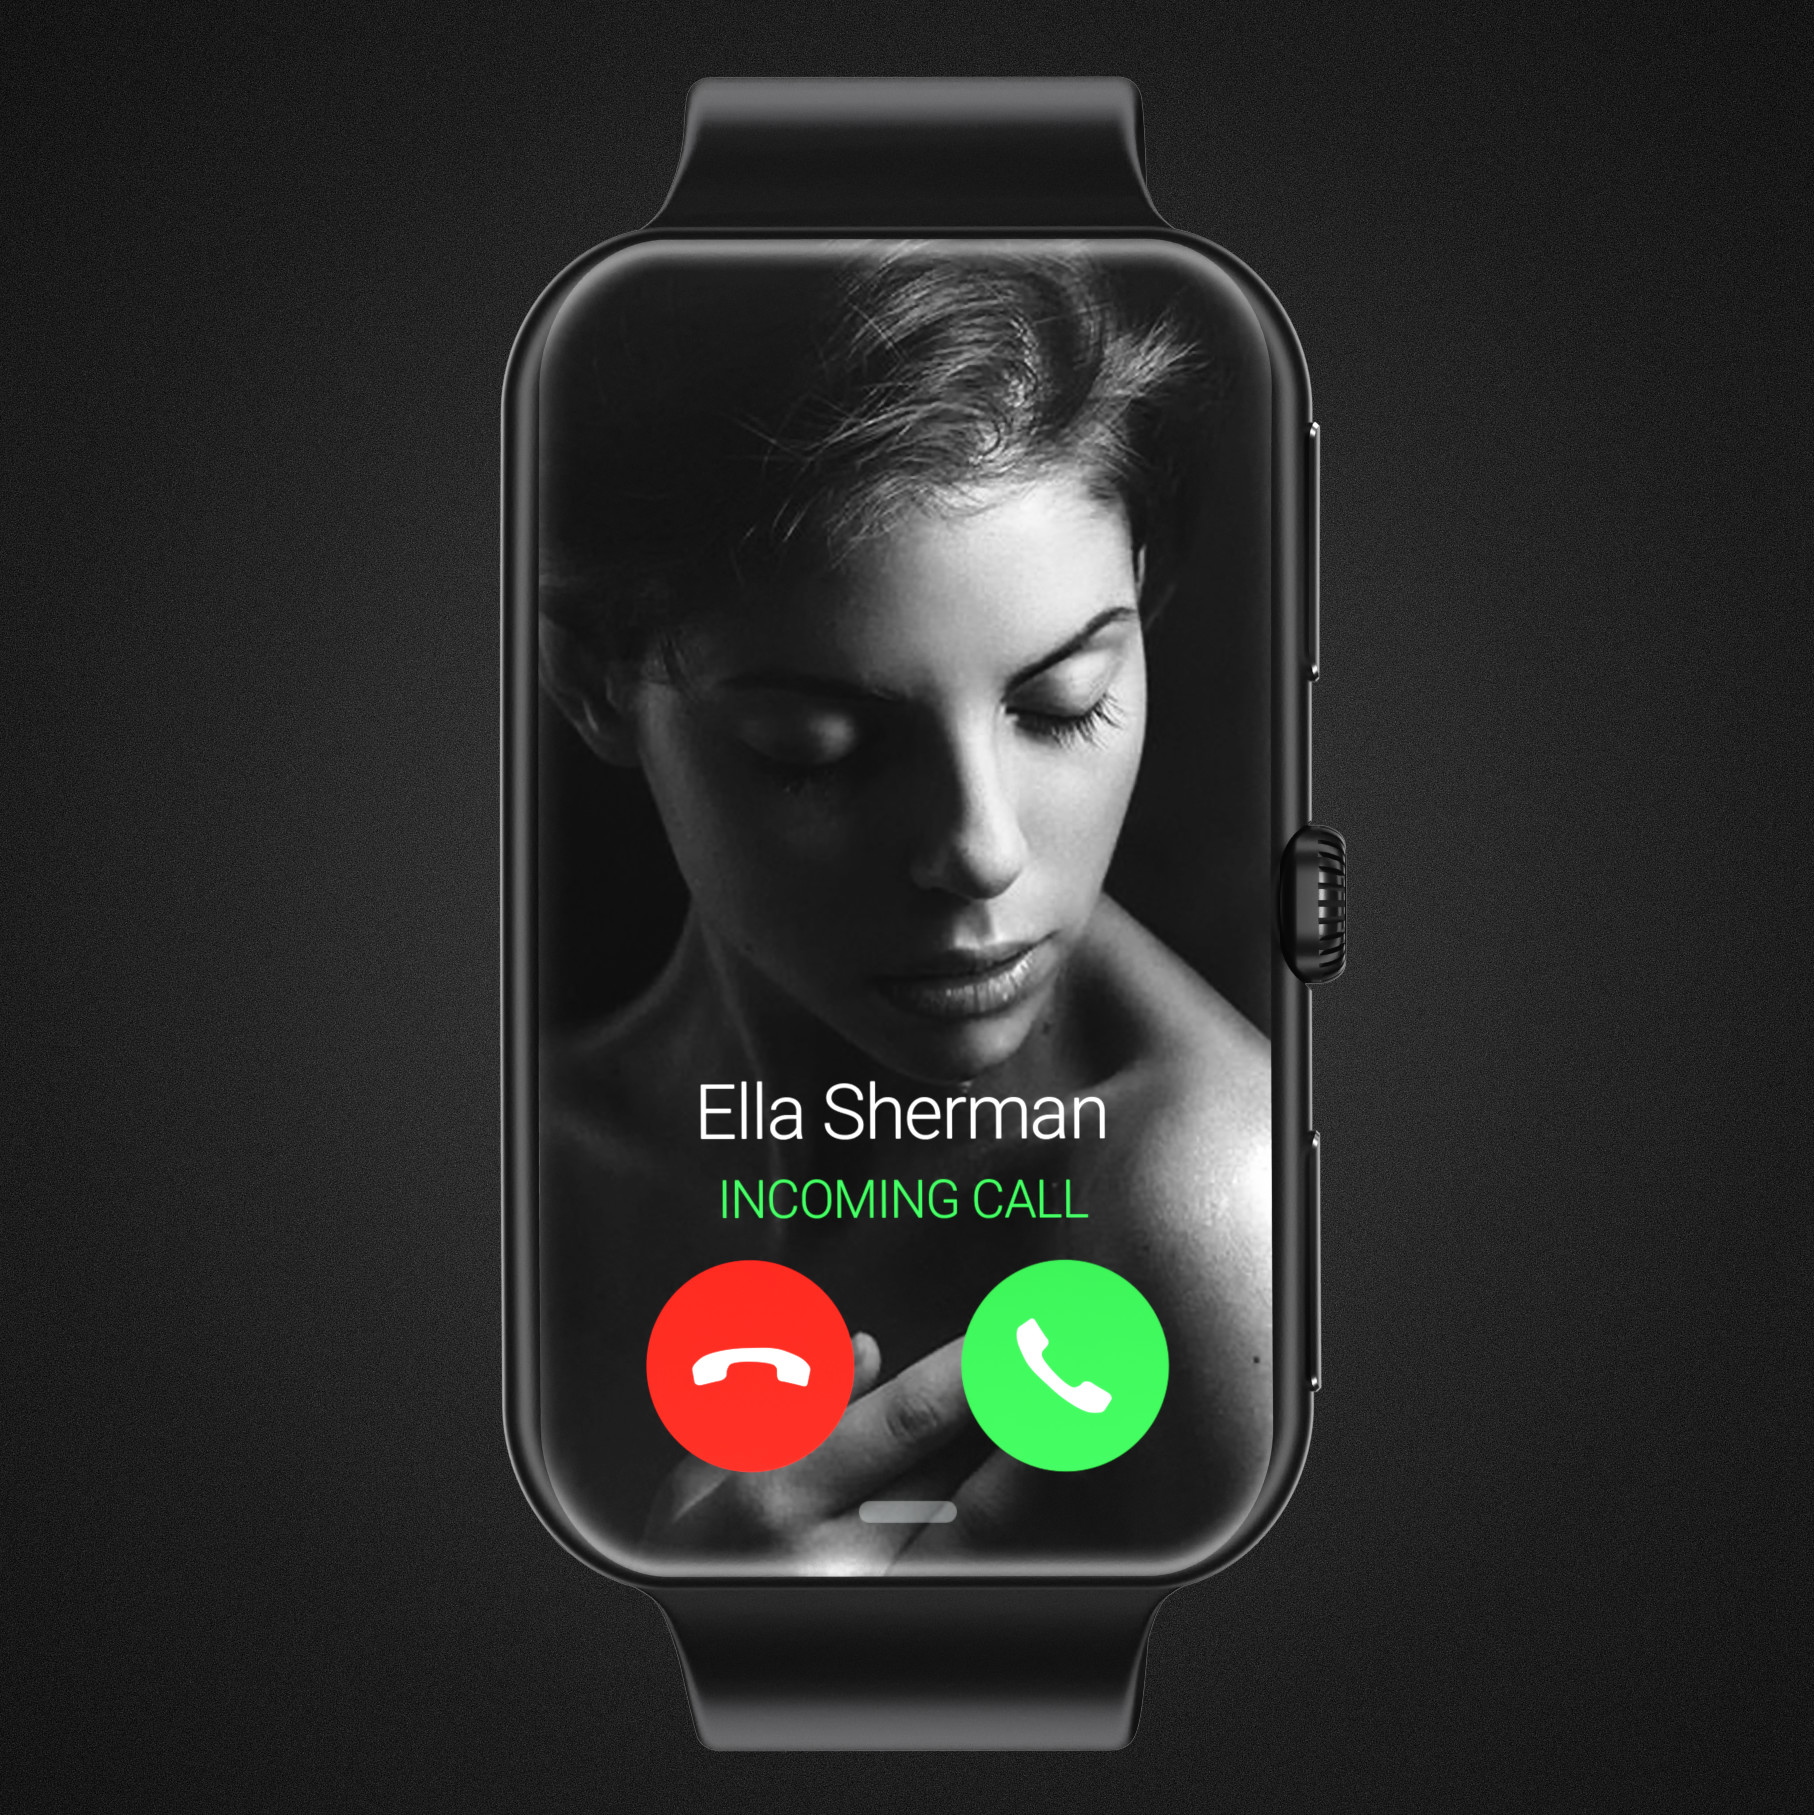 Roman tikhonov apple watch 5 render4